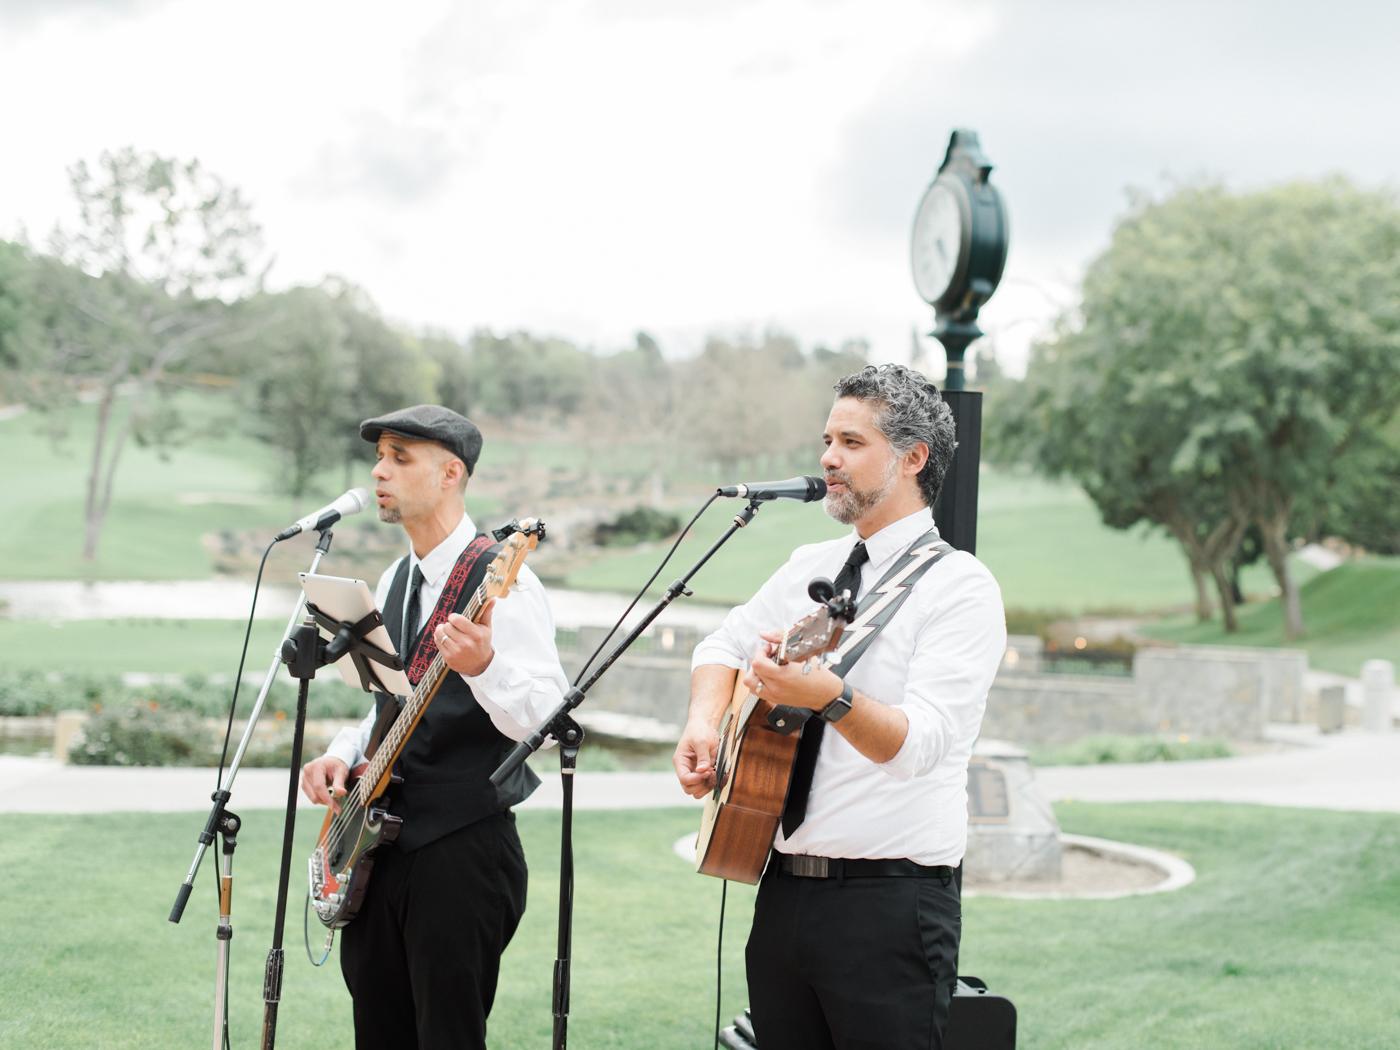 Friendly_Hills_Country_Club_fine_art_wedding_photographer_los_angeles_paris-26.jpg